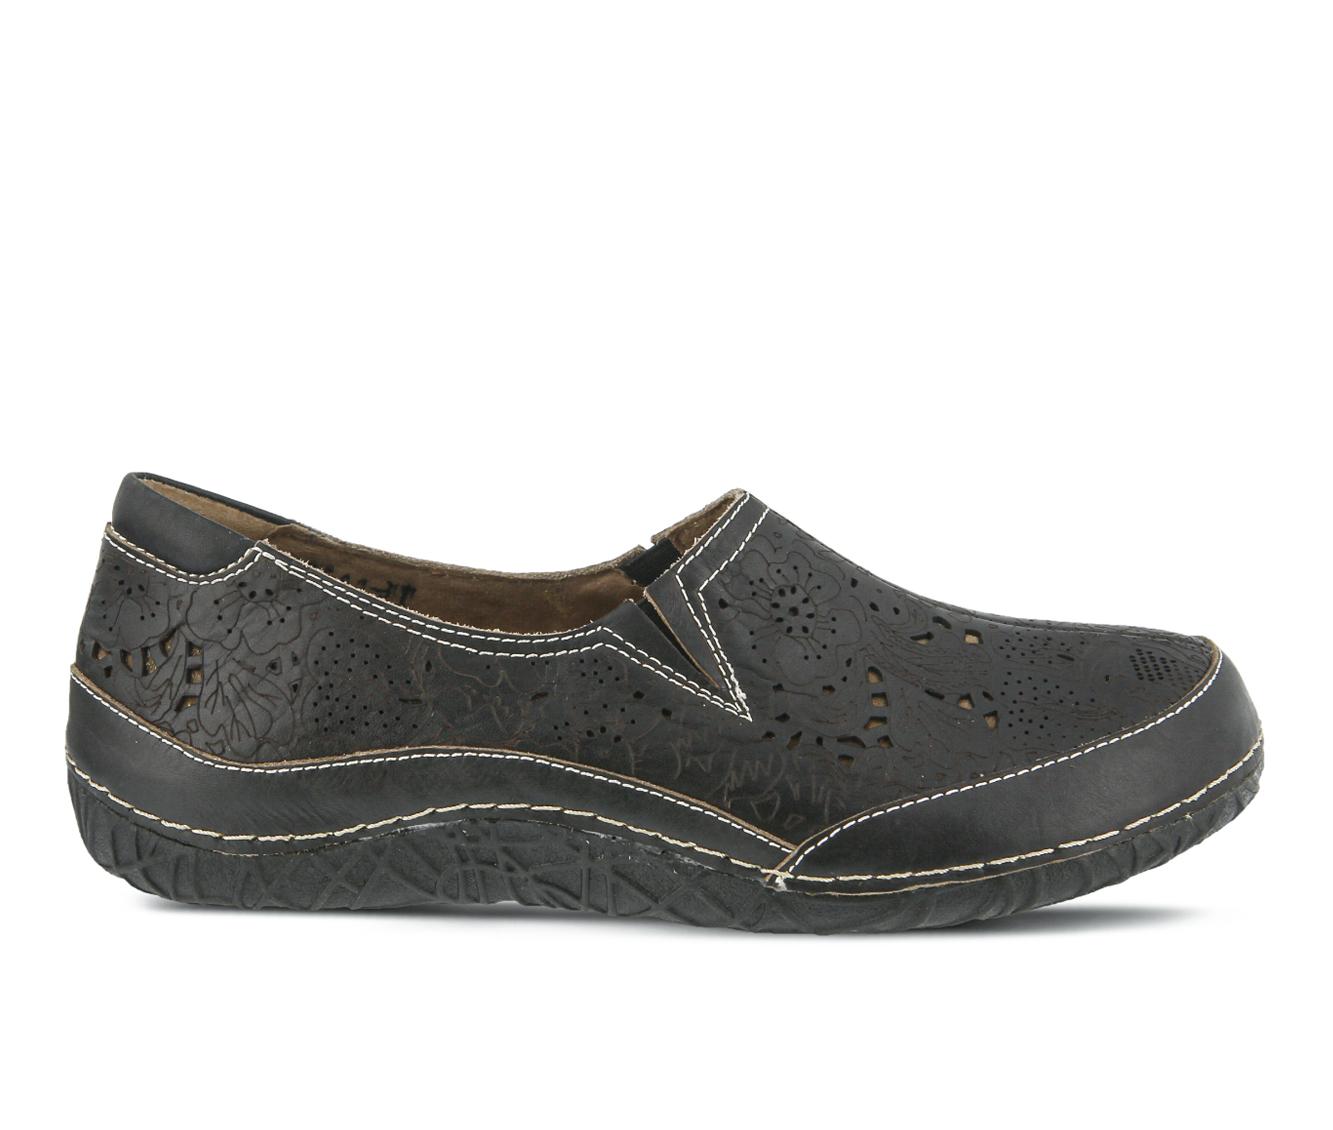 L'Artiste Libora Women's Shoe (Black Leather)